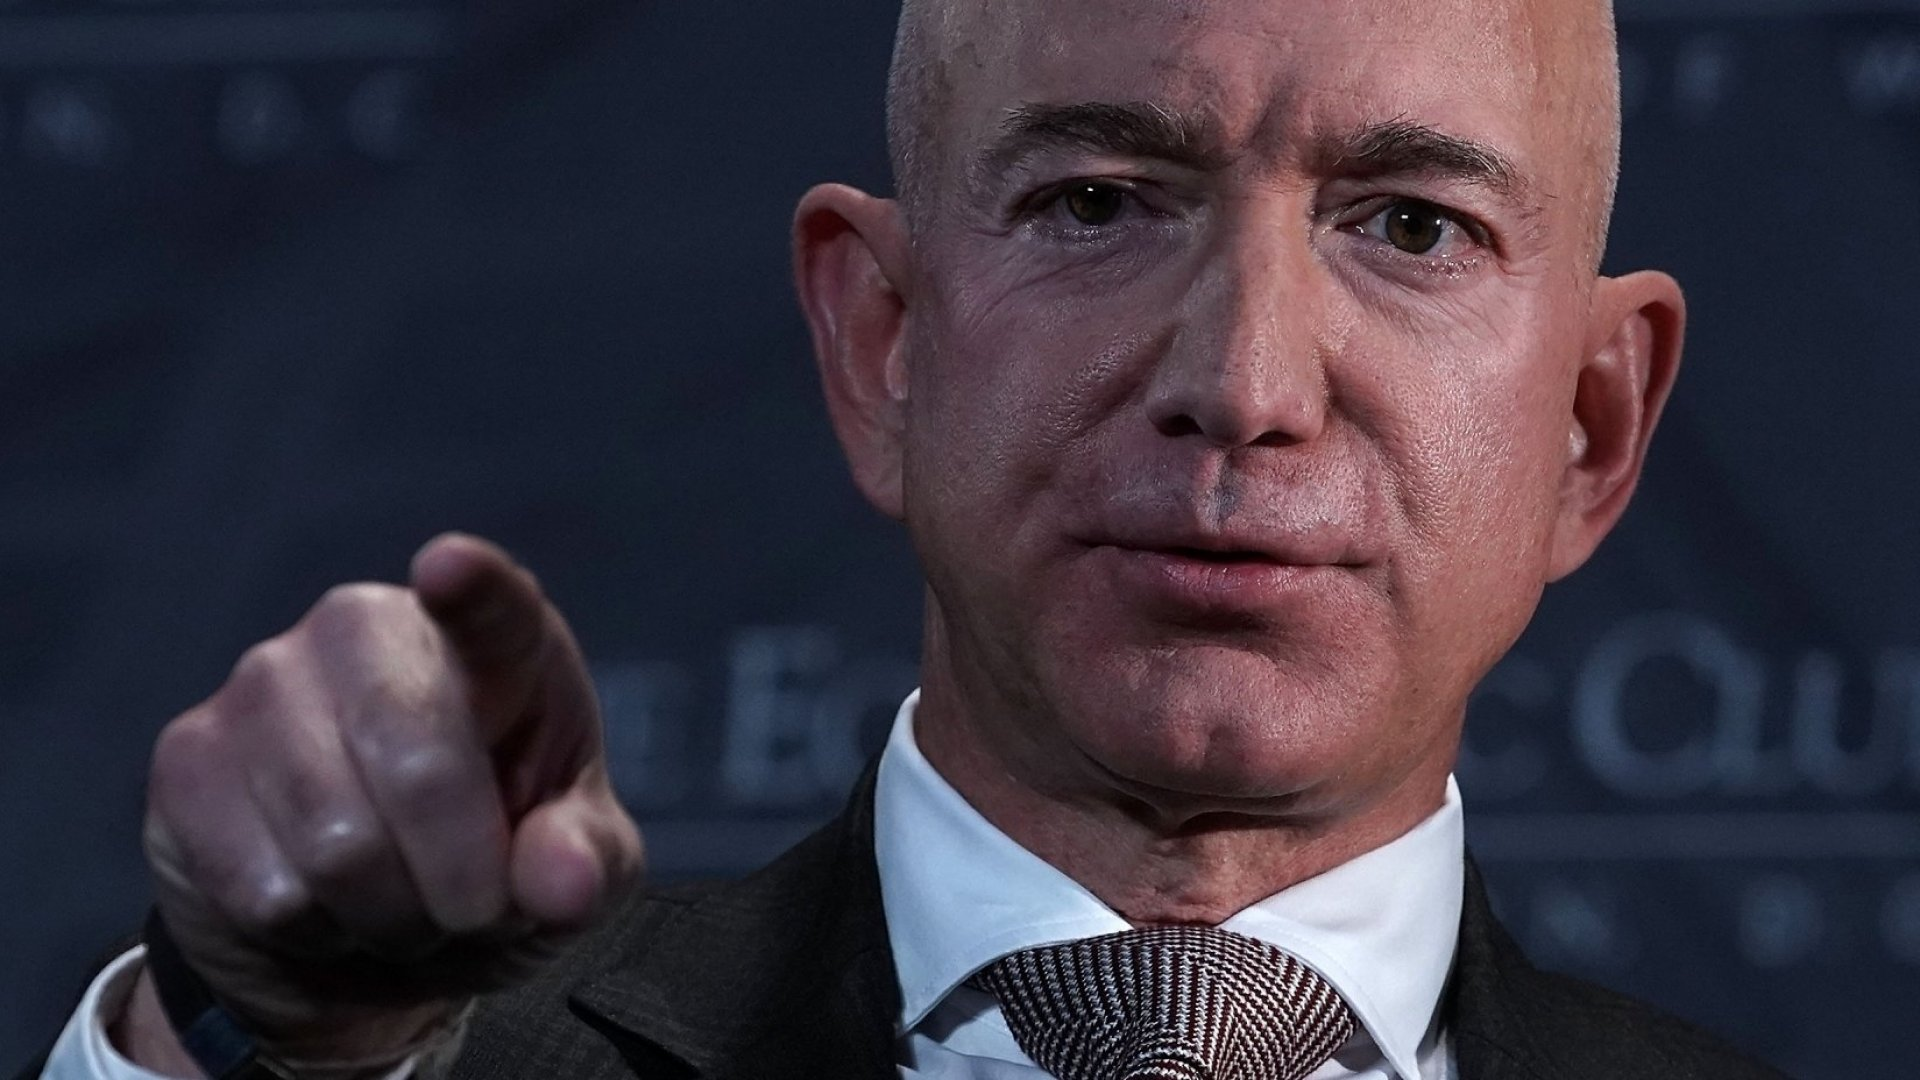 Jeff Bezos's Top Investigator Says Saudi Arabia Hacked the Amazon Founder's Phone